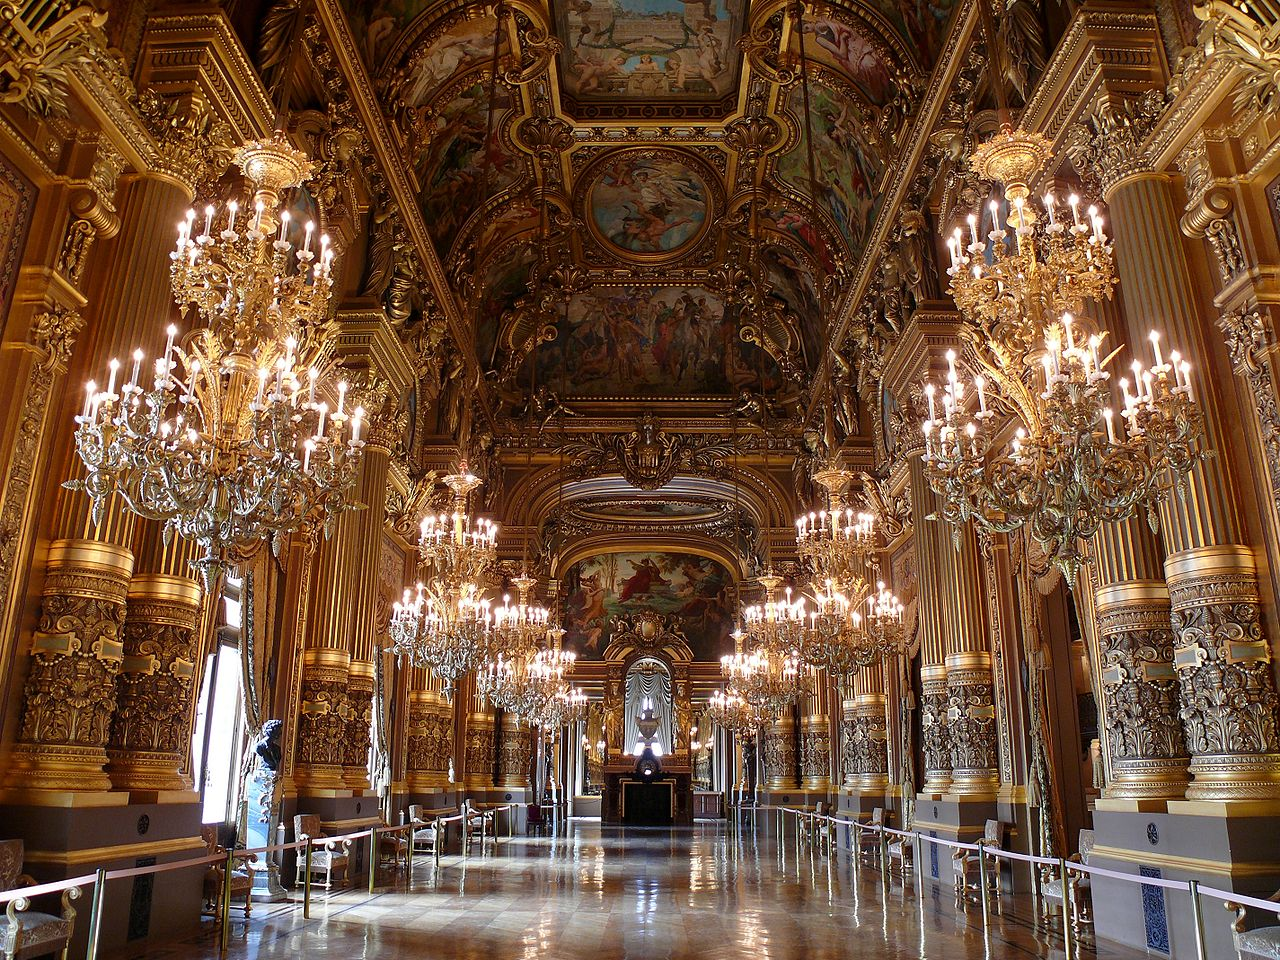 Superficie Grand Foyer Opera Garnier : File op�ra garnier le grand foyer g wikimedia commons